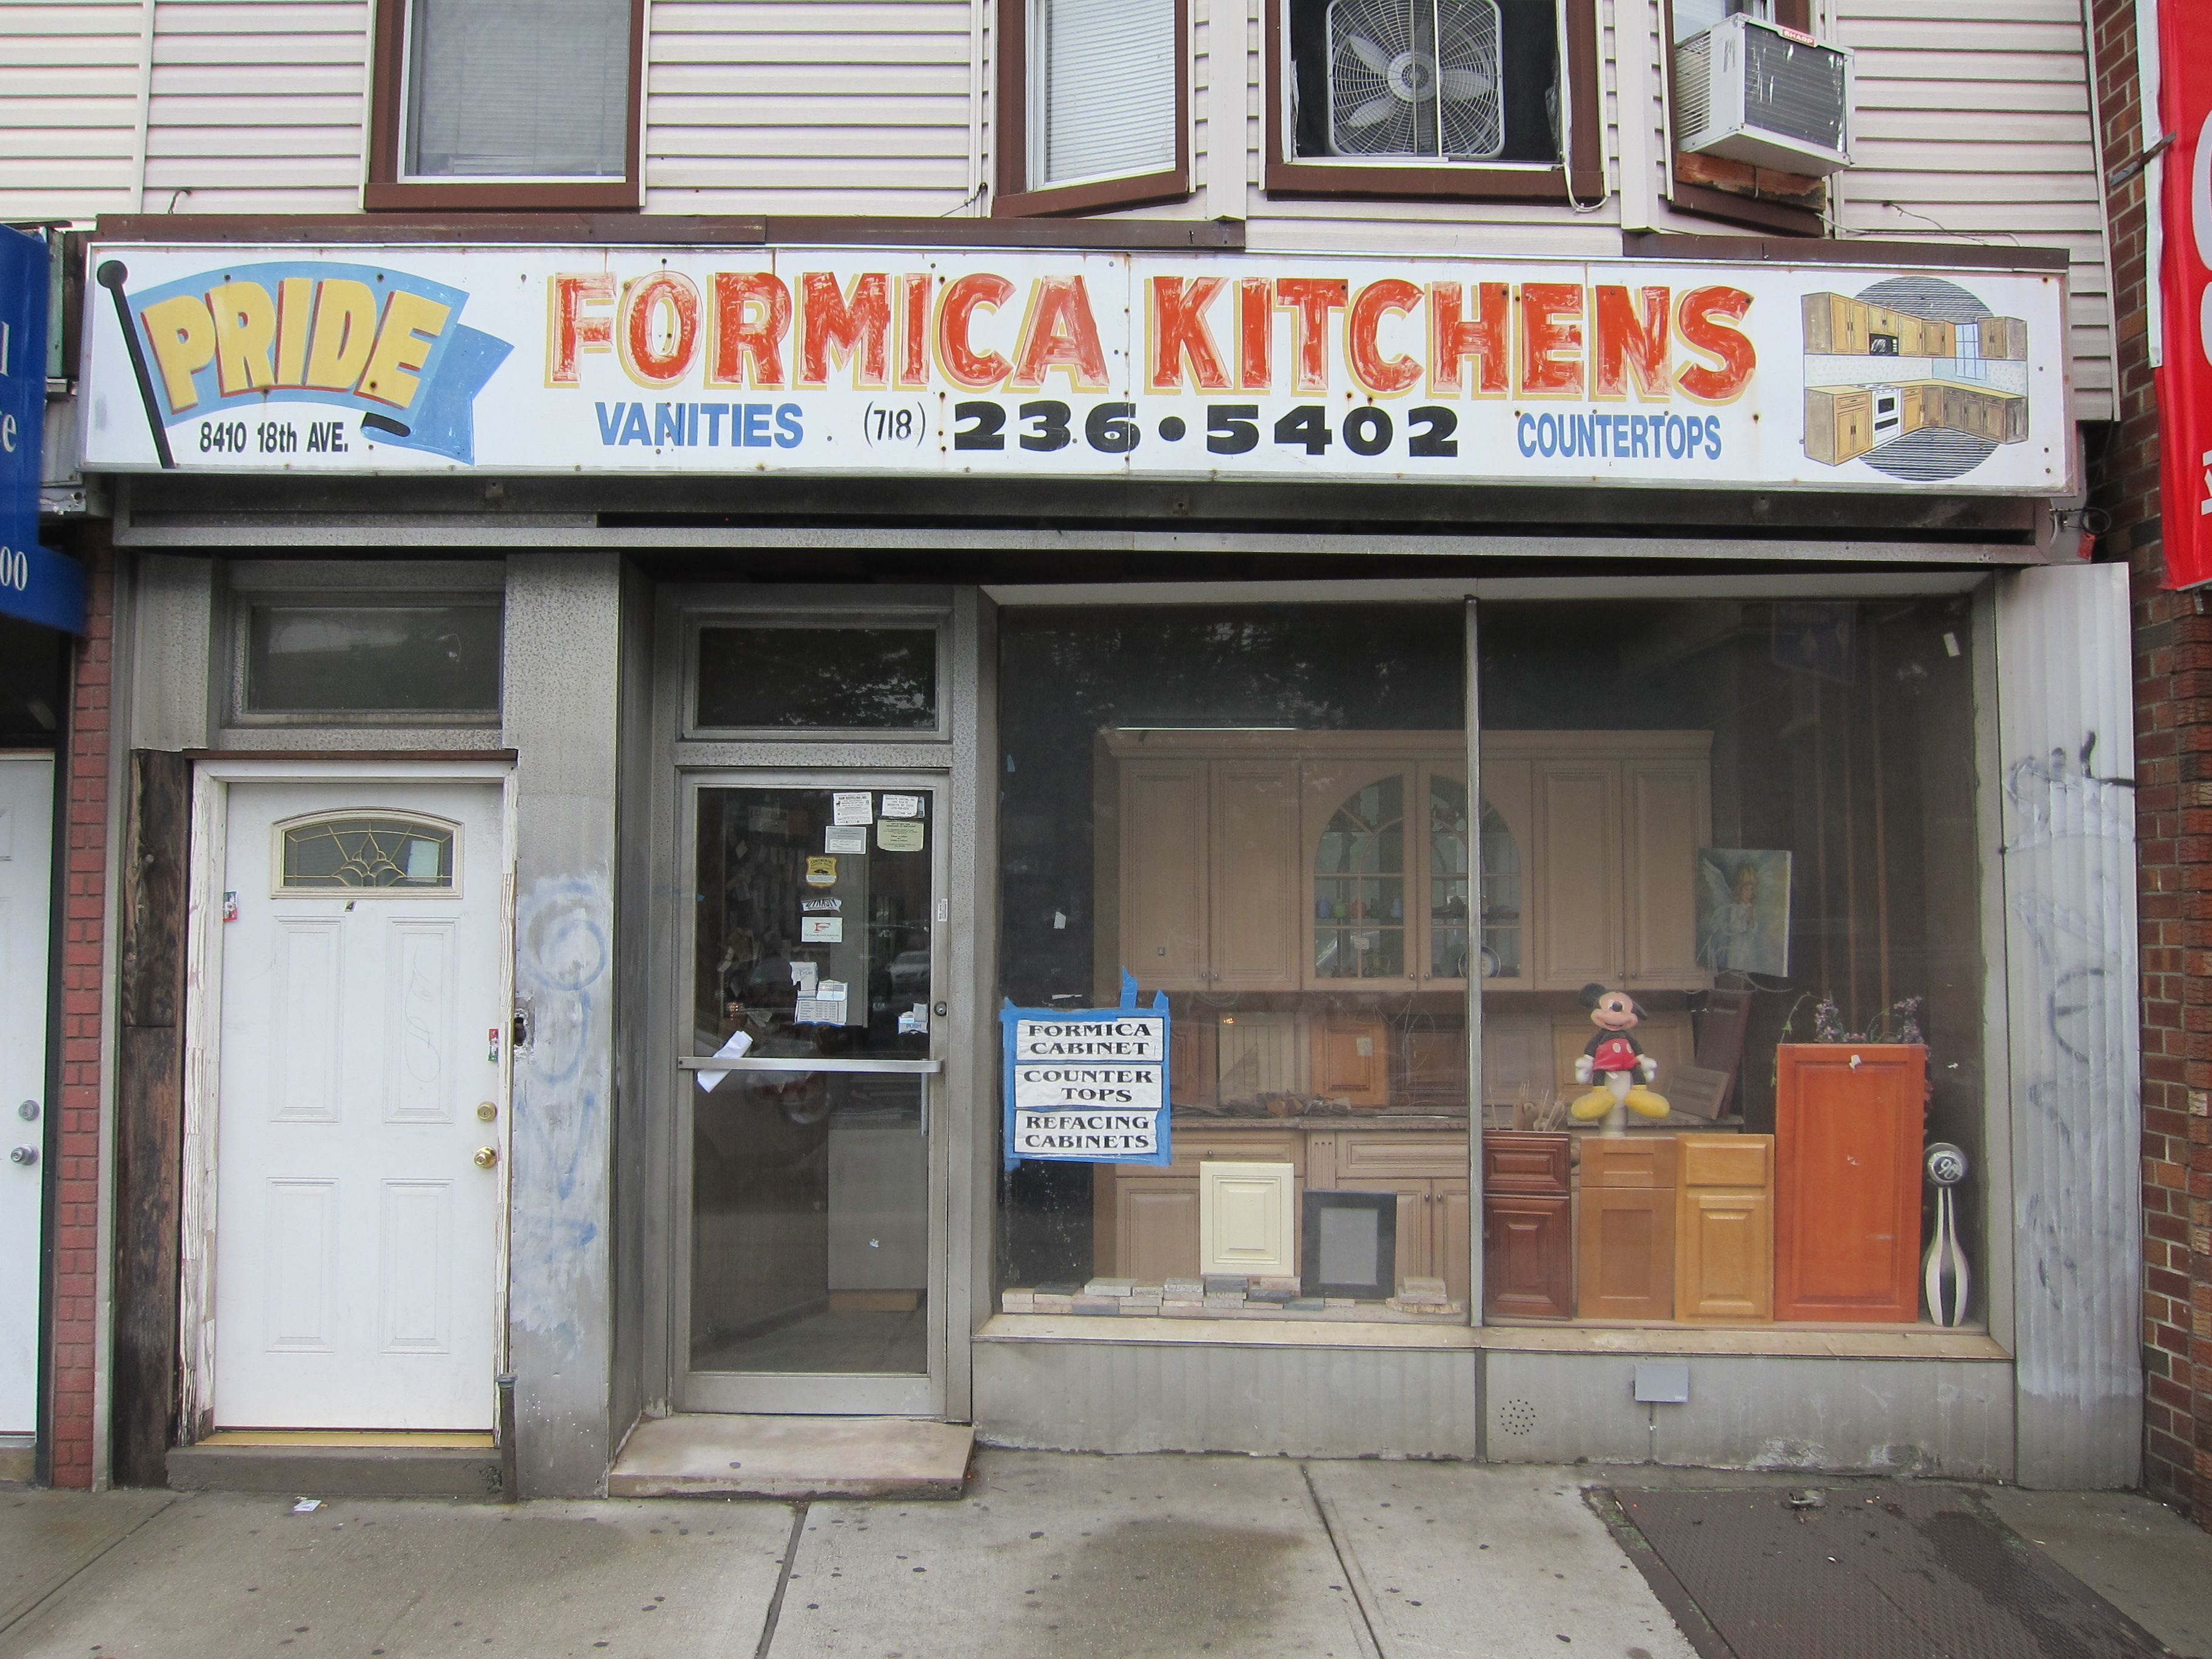 Pride Formica Kitchens 18th Ave Bk